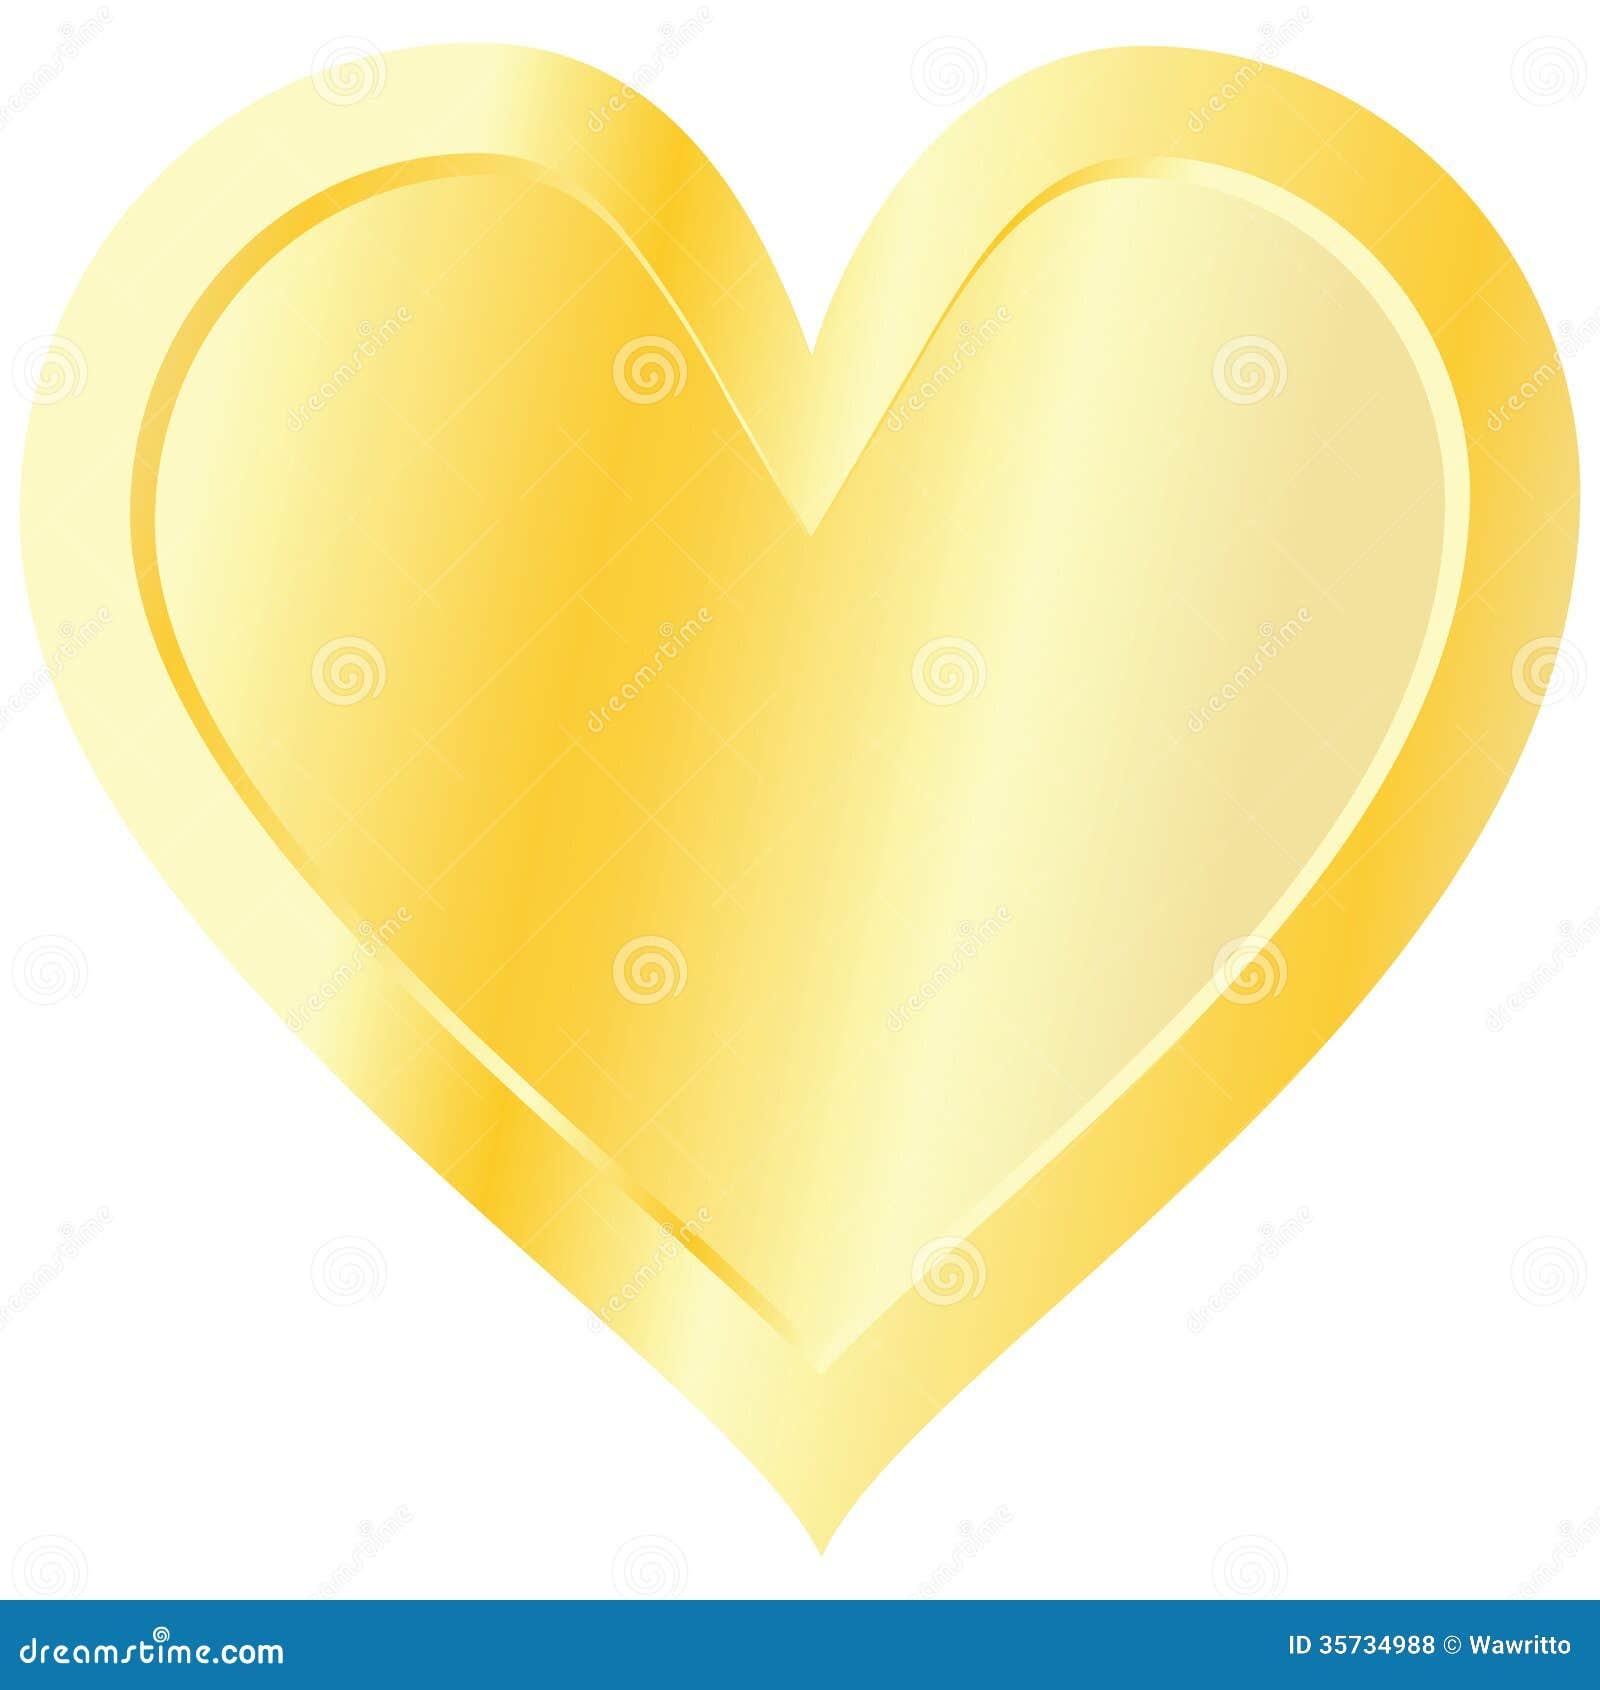 Royalty Free Stock Photos Golden Heart Isolated White Background Illustration Image35734988 on Romantic Frame Transparent